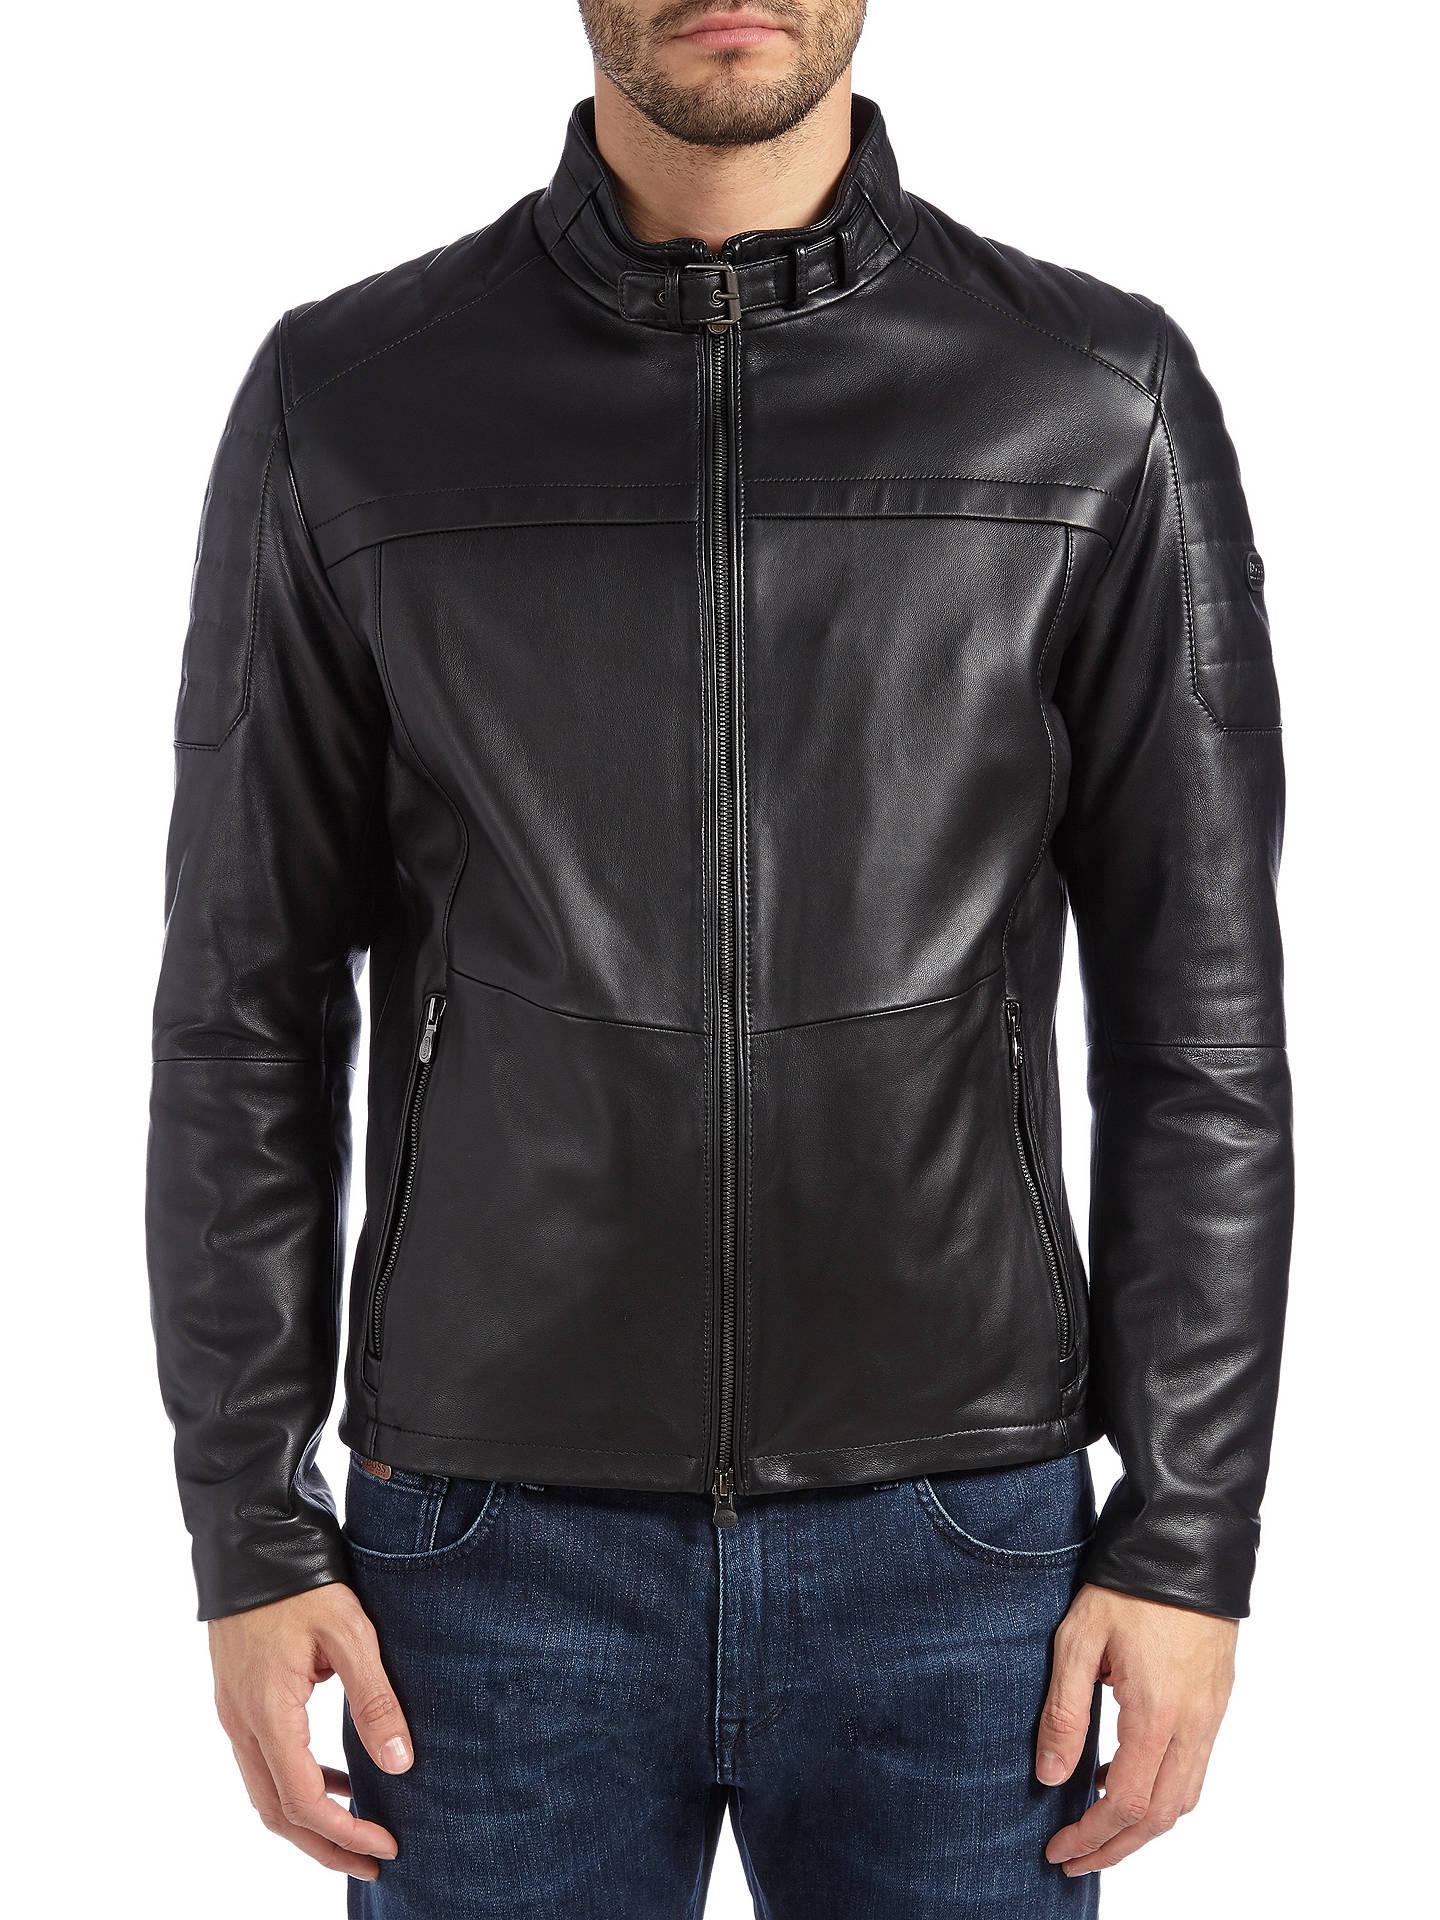 5d8c9ba9d Buy BOSS Green Jeron Leather Jacket, Black, 36R Online at johnlewis.com ...